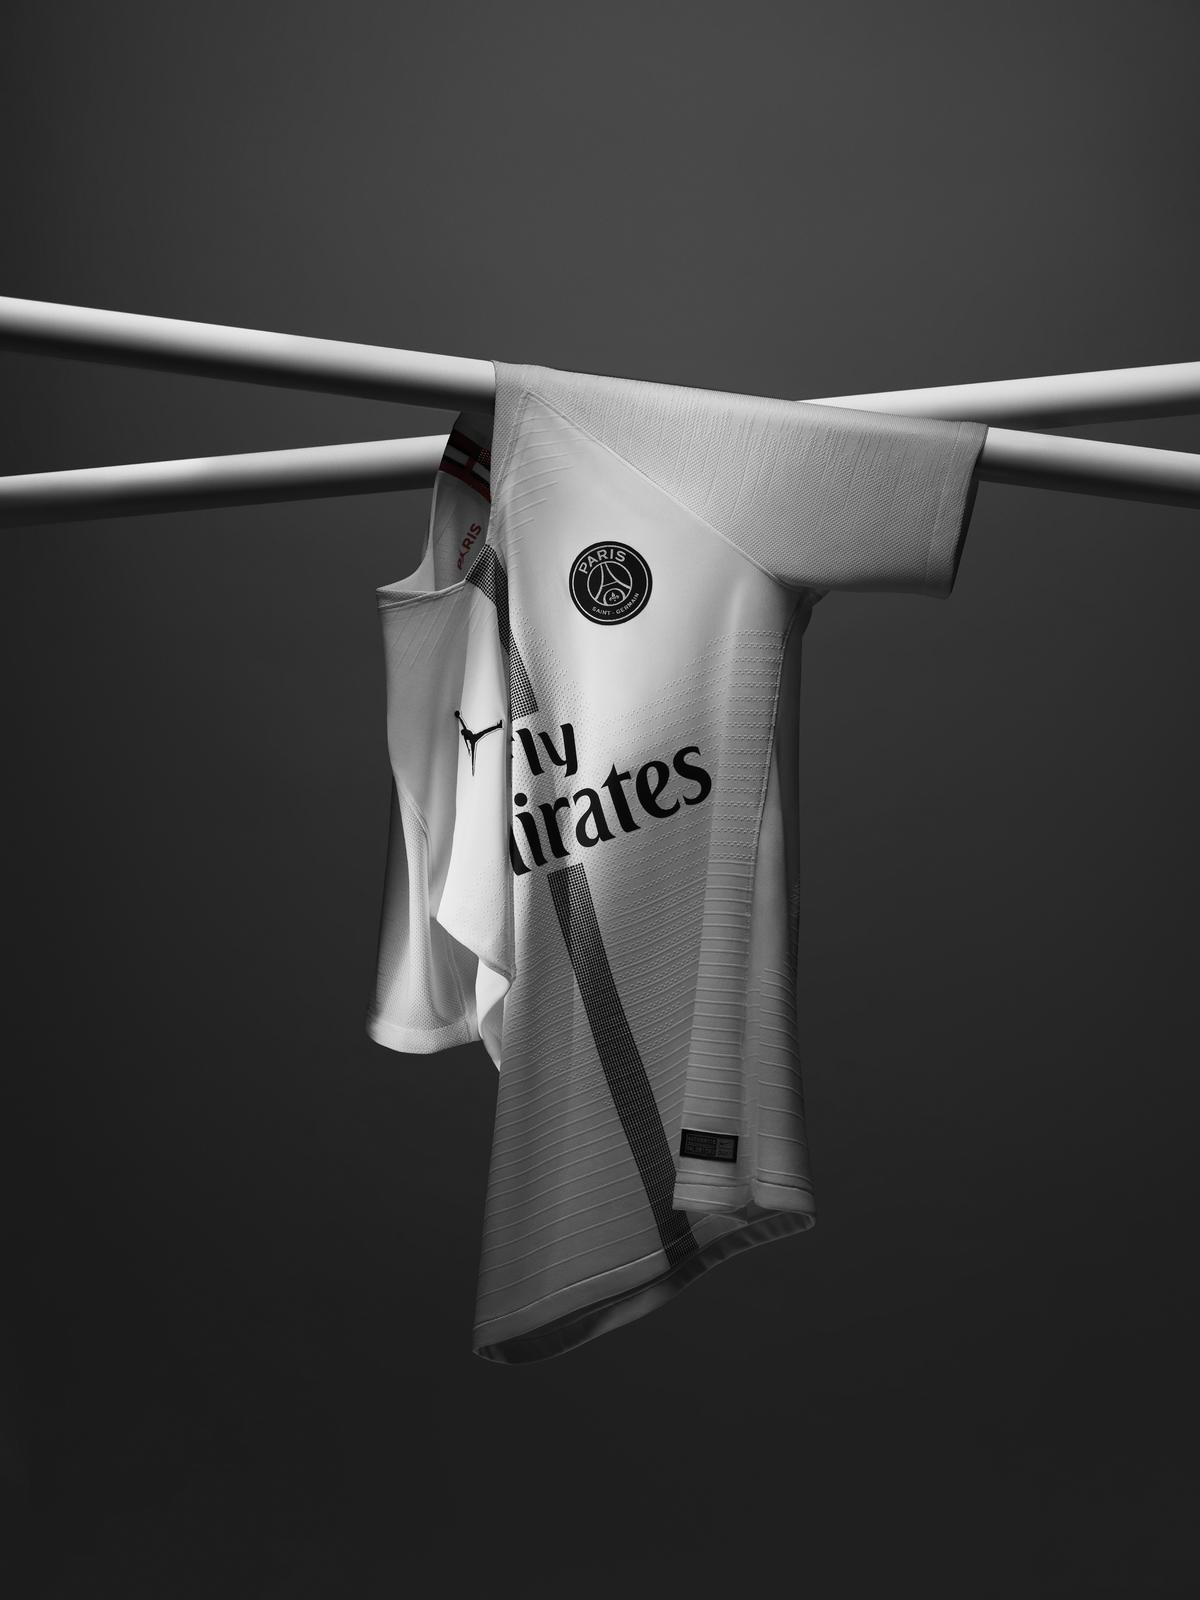 Jordan_Brand__Paris_Saint-Germain_as_its_First-Ever_Football_Club_Soccer_21_81736